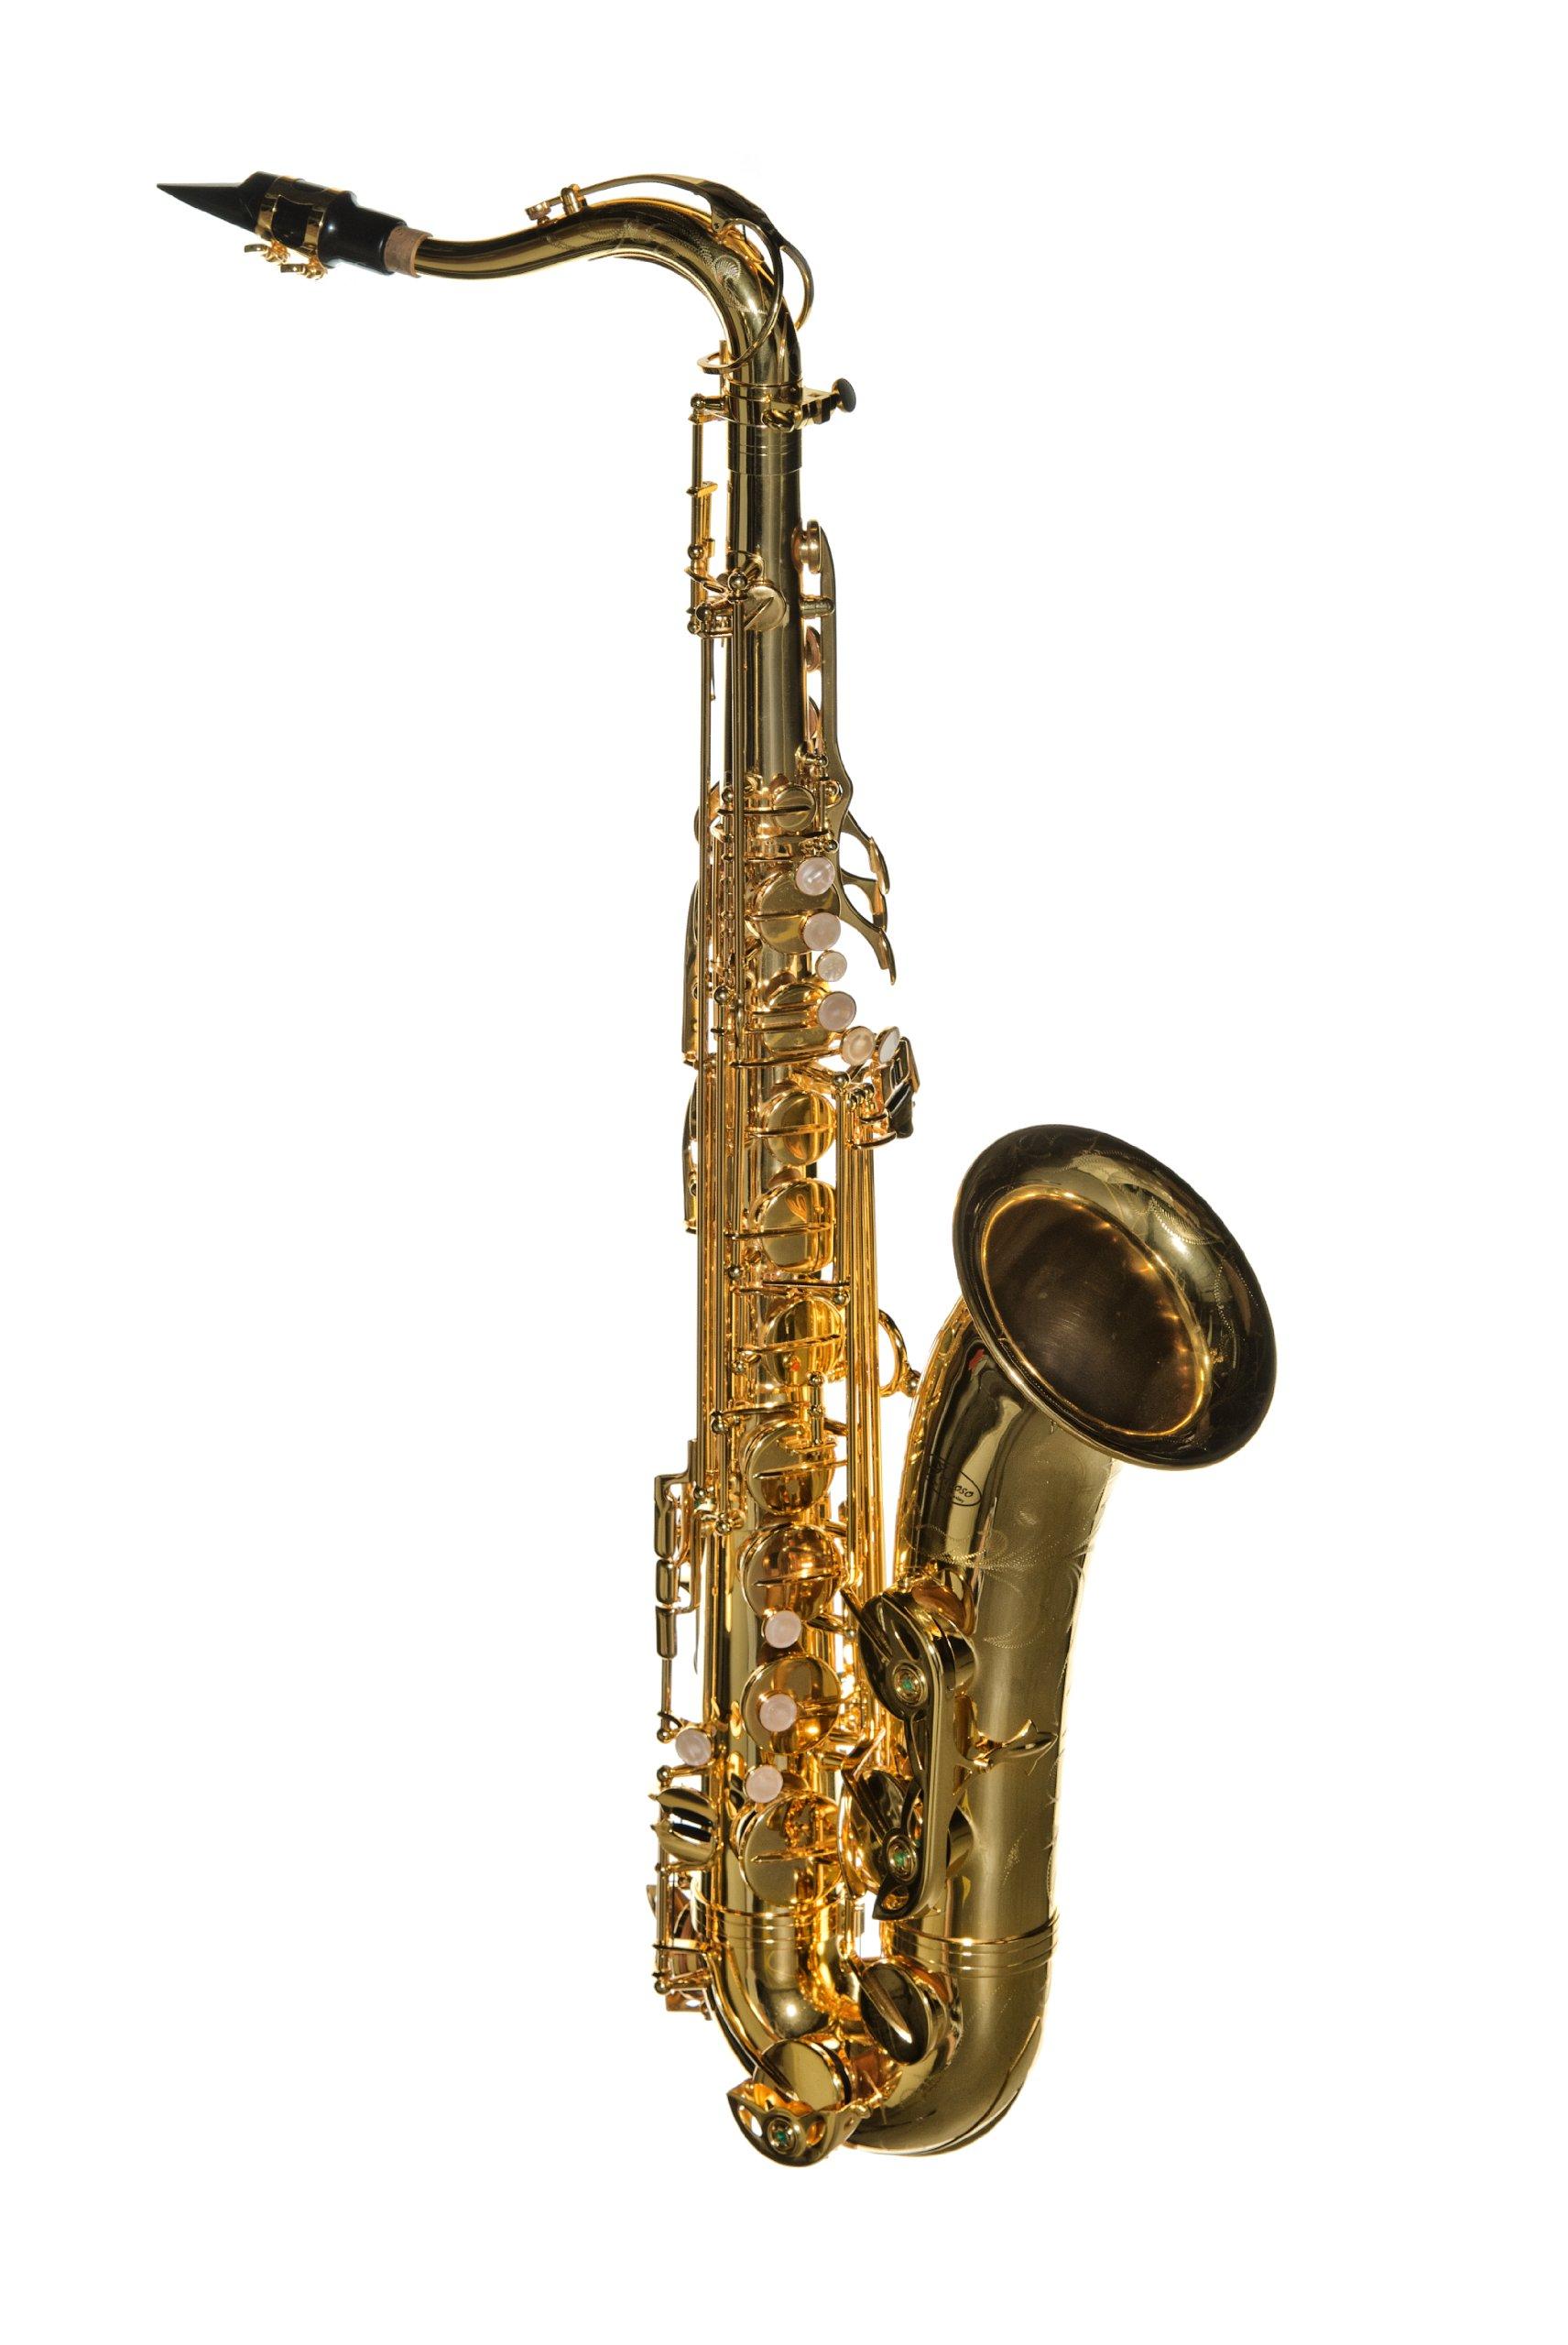 VIRT2005G - Gold Plated -Virtuoso Saxophones by RS Berkeley Saxophone